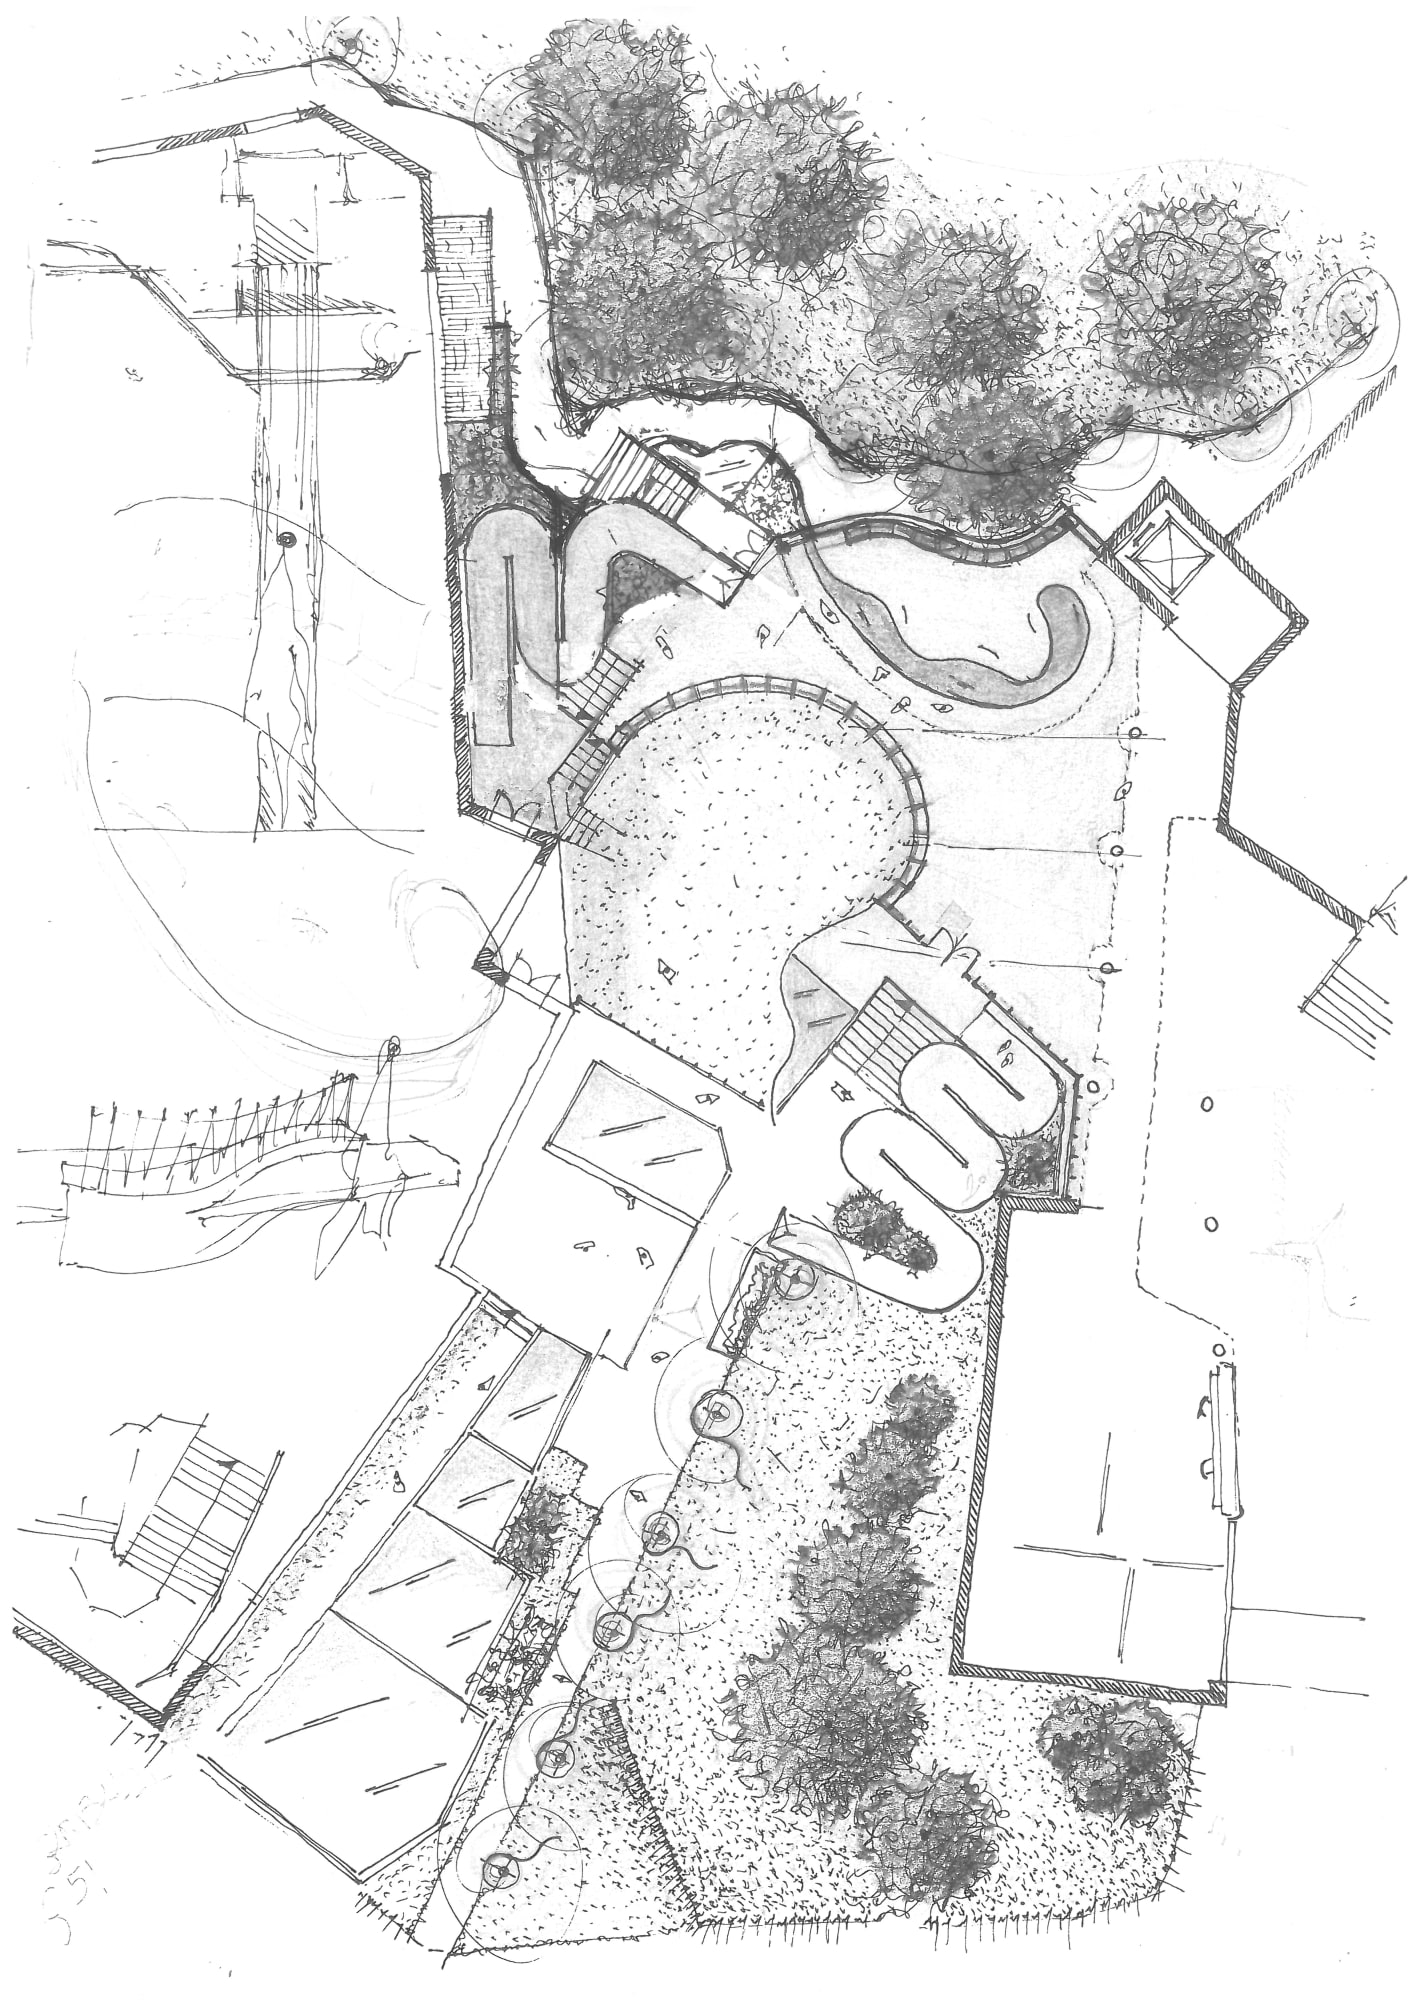 1414x2000 Elleno Squassabia An International Architectural Competition